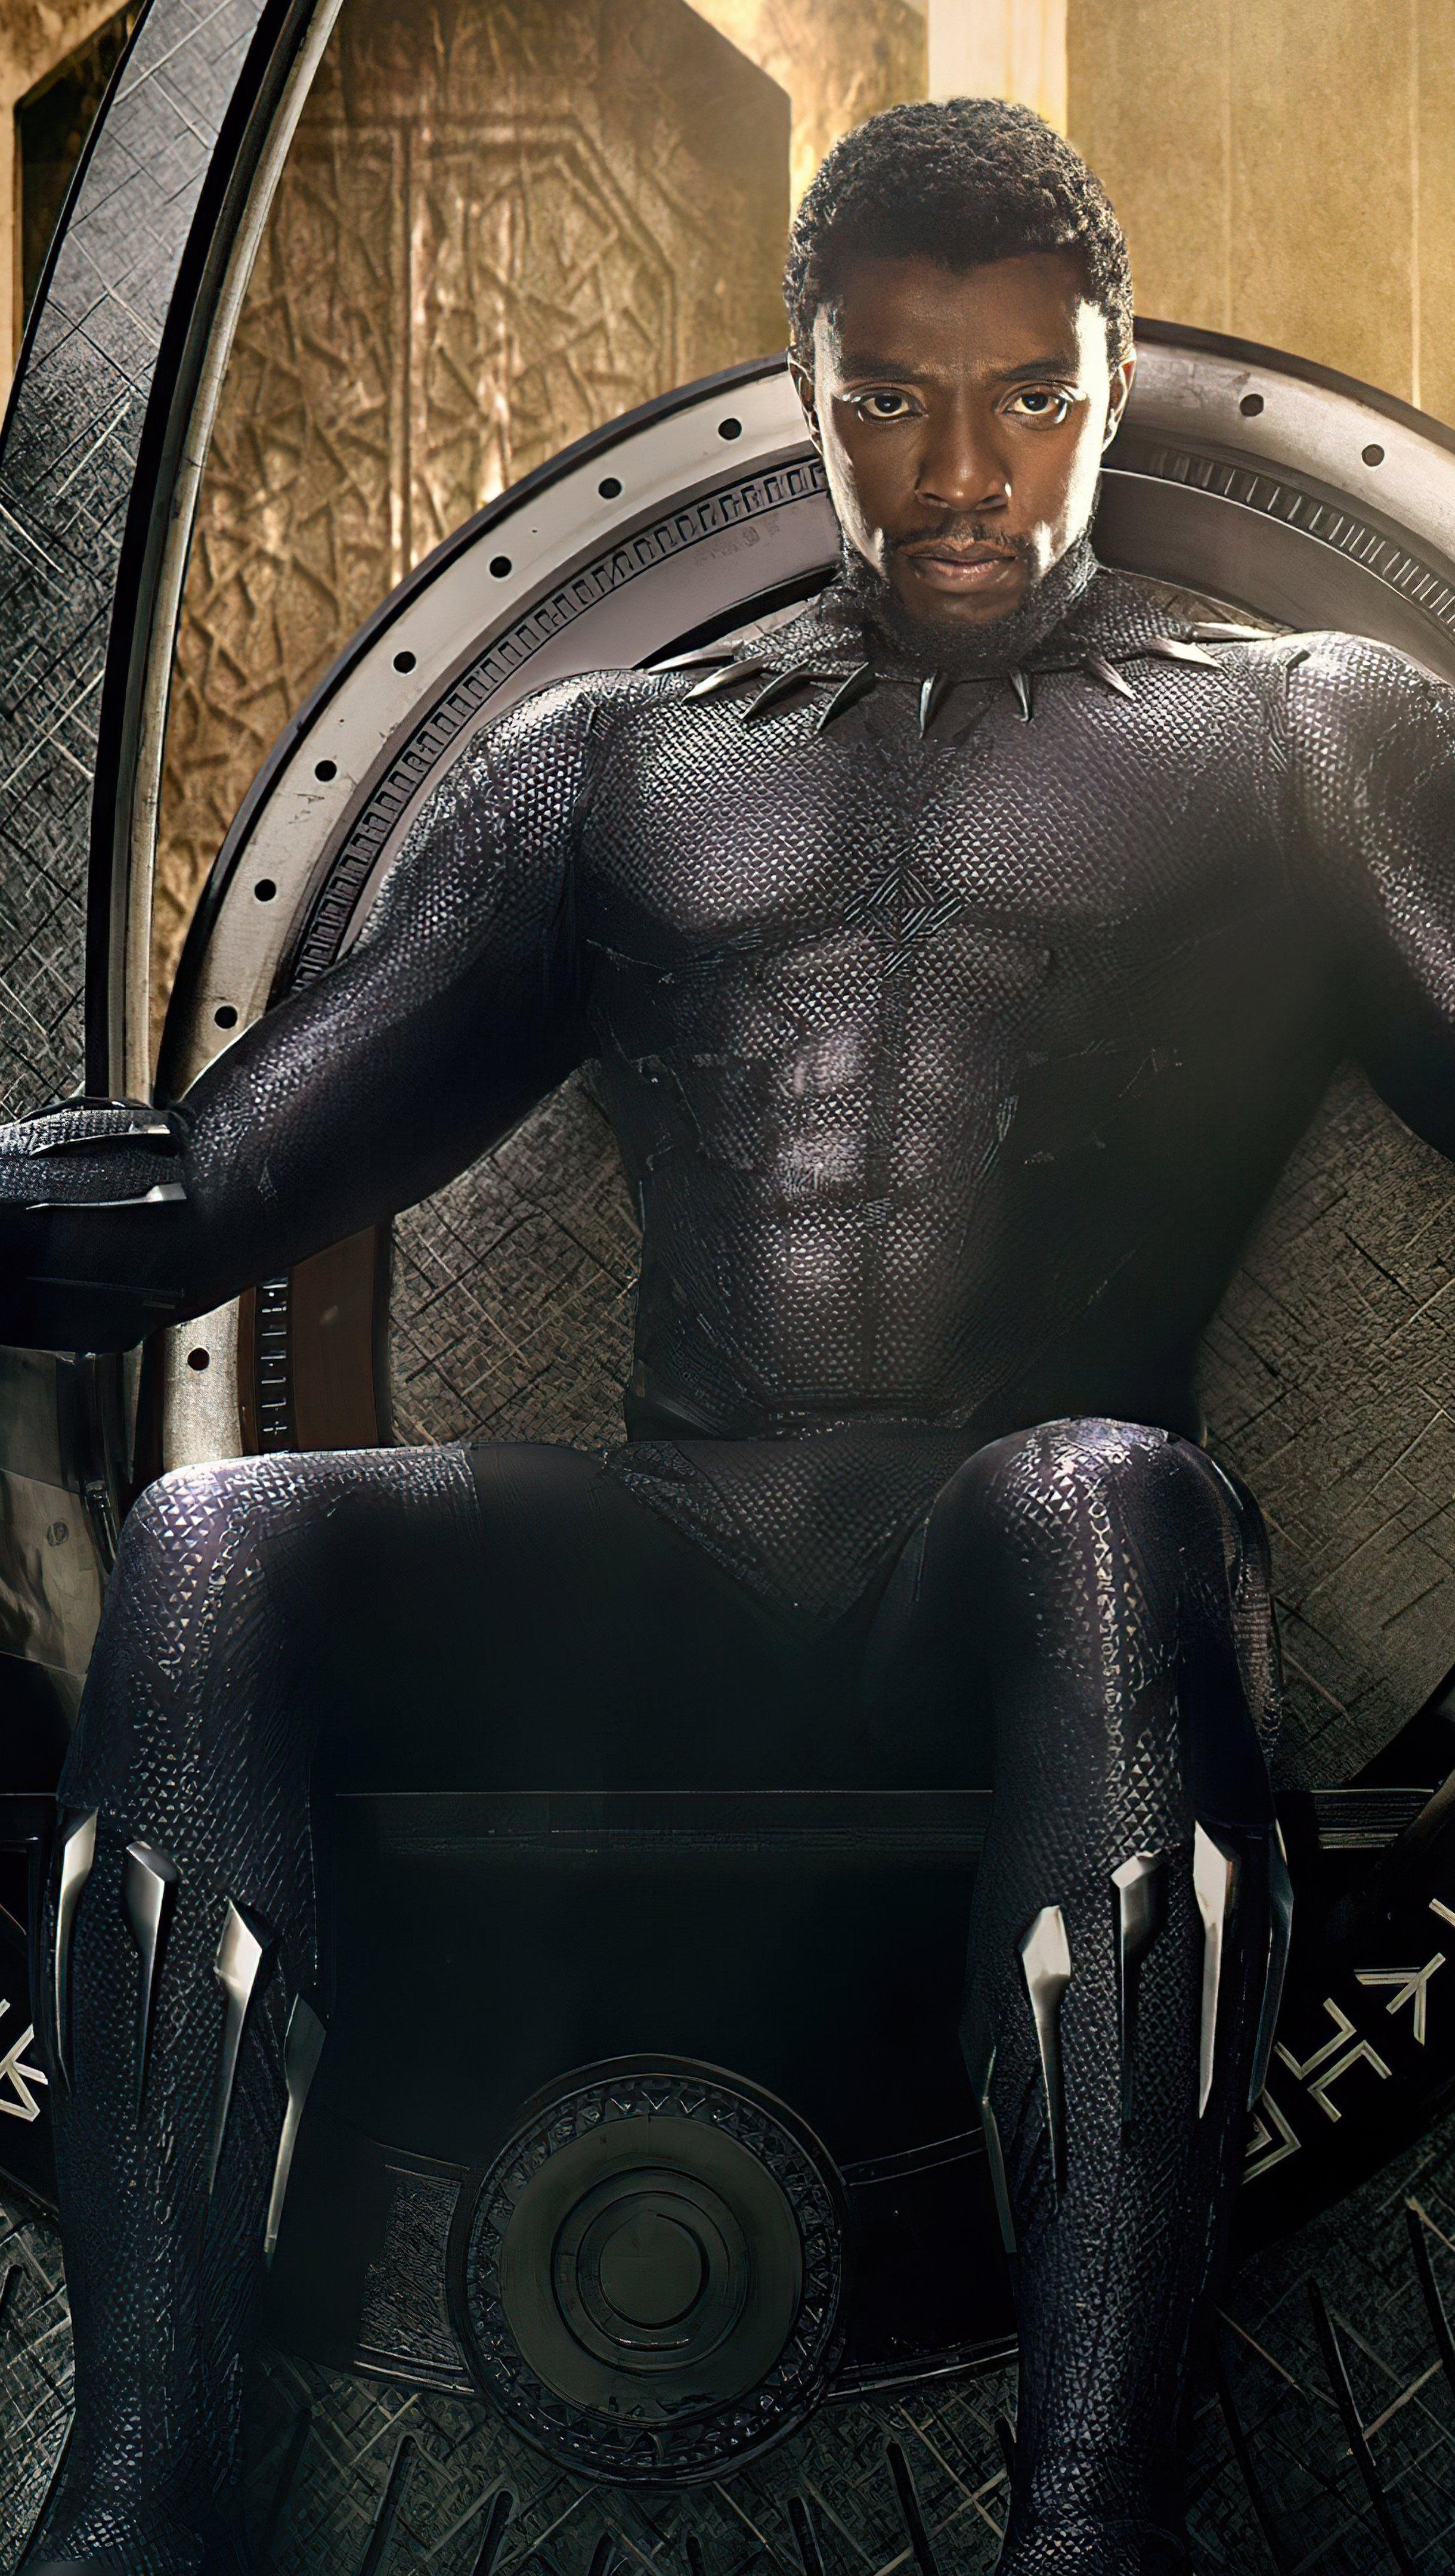 Wallpaper Chadwick Aaron Boseman Black Panther Vertical